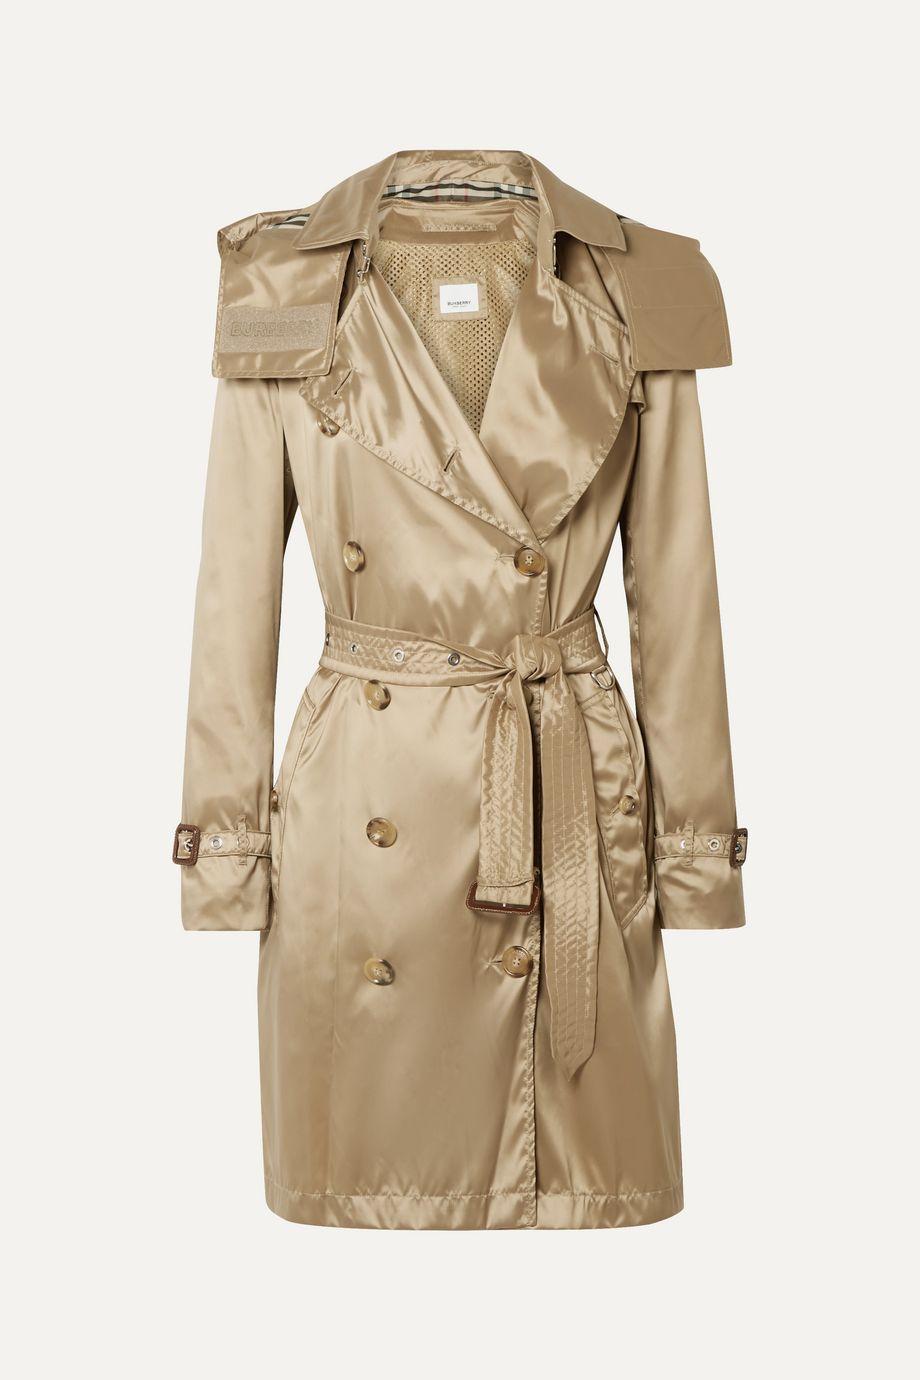 Burberry The Kensington hooded ECONYL trench coat